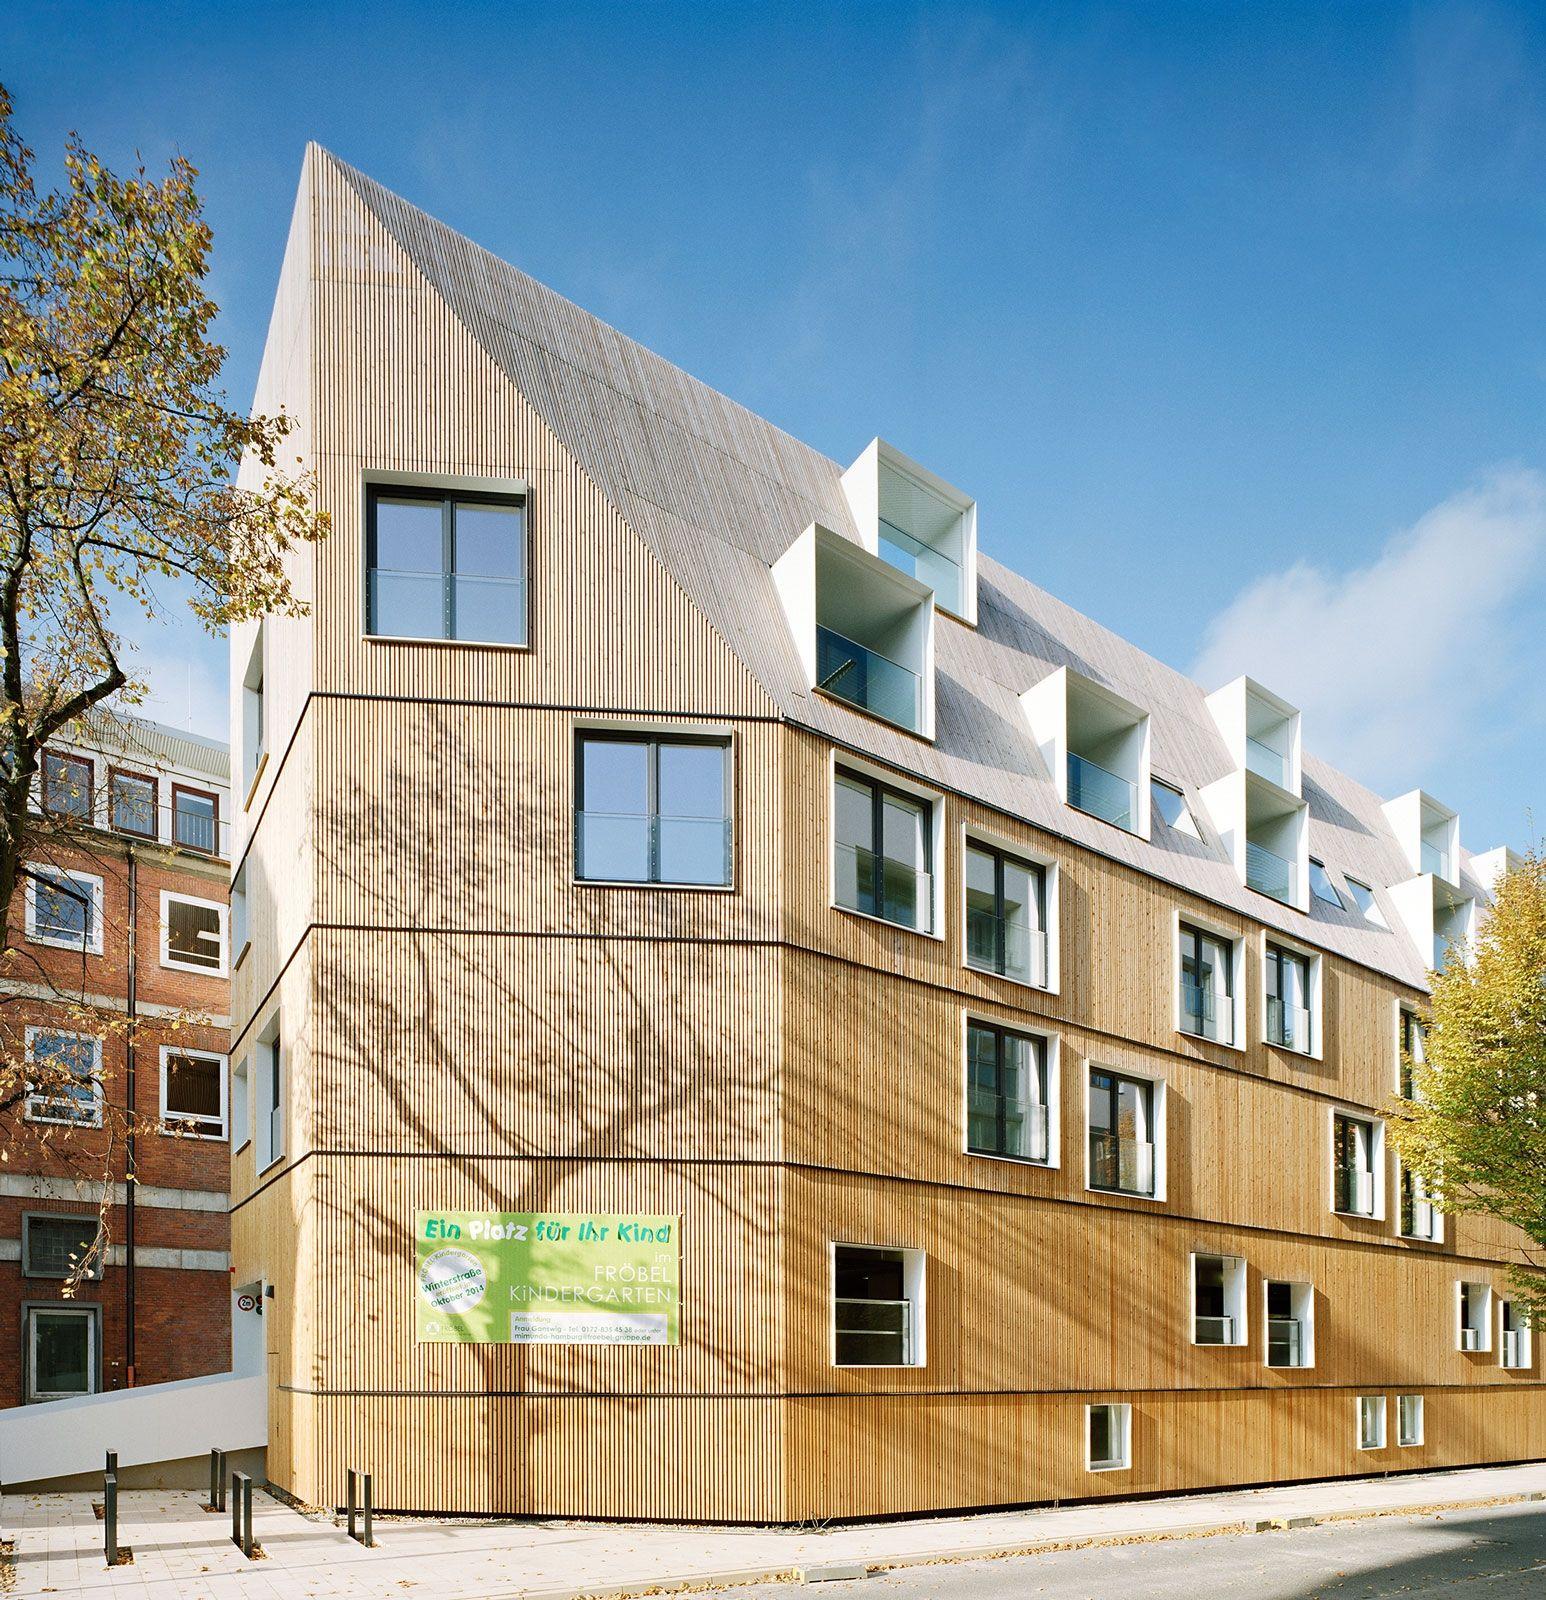 "Projekt ""KITA Winterstraße, Hamburg"" I DE-22765 Hamburg | Architekten: LH Architekten I competitionline"